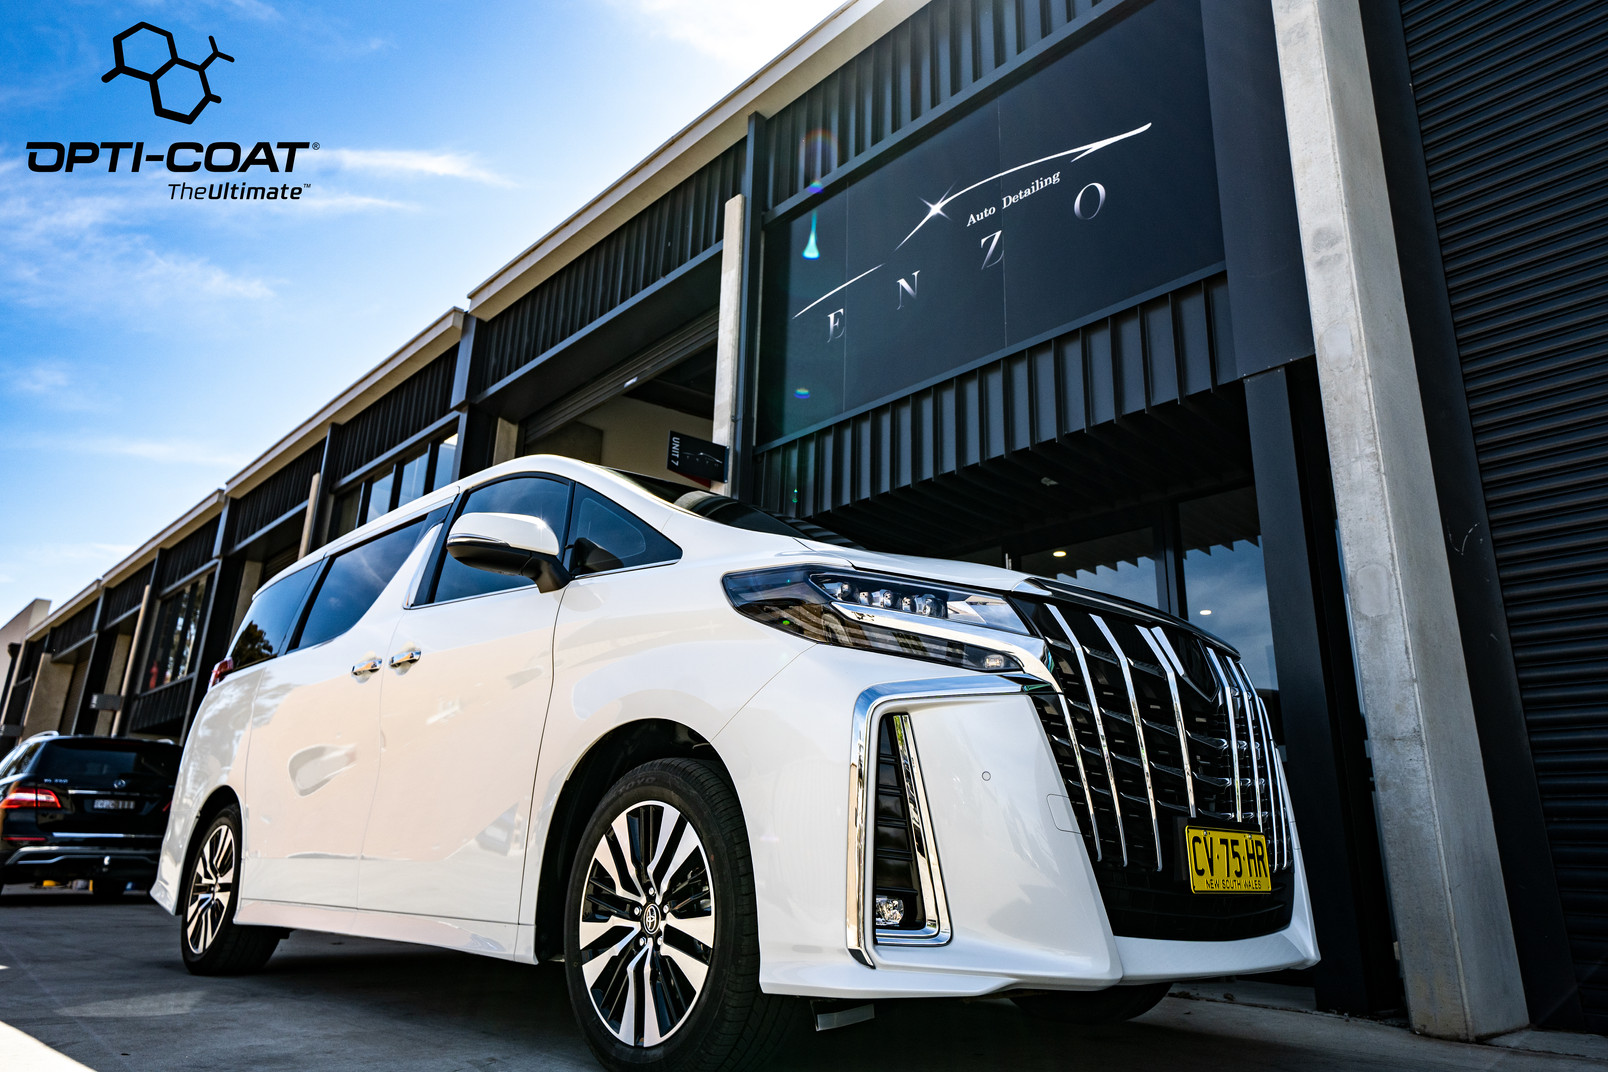 2019 Toyota Alphard - imported